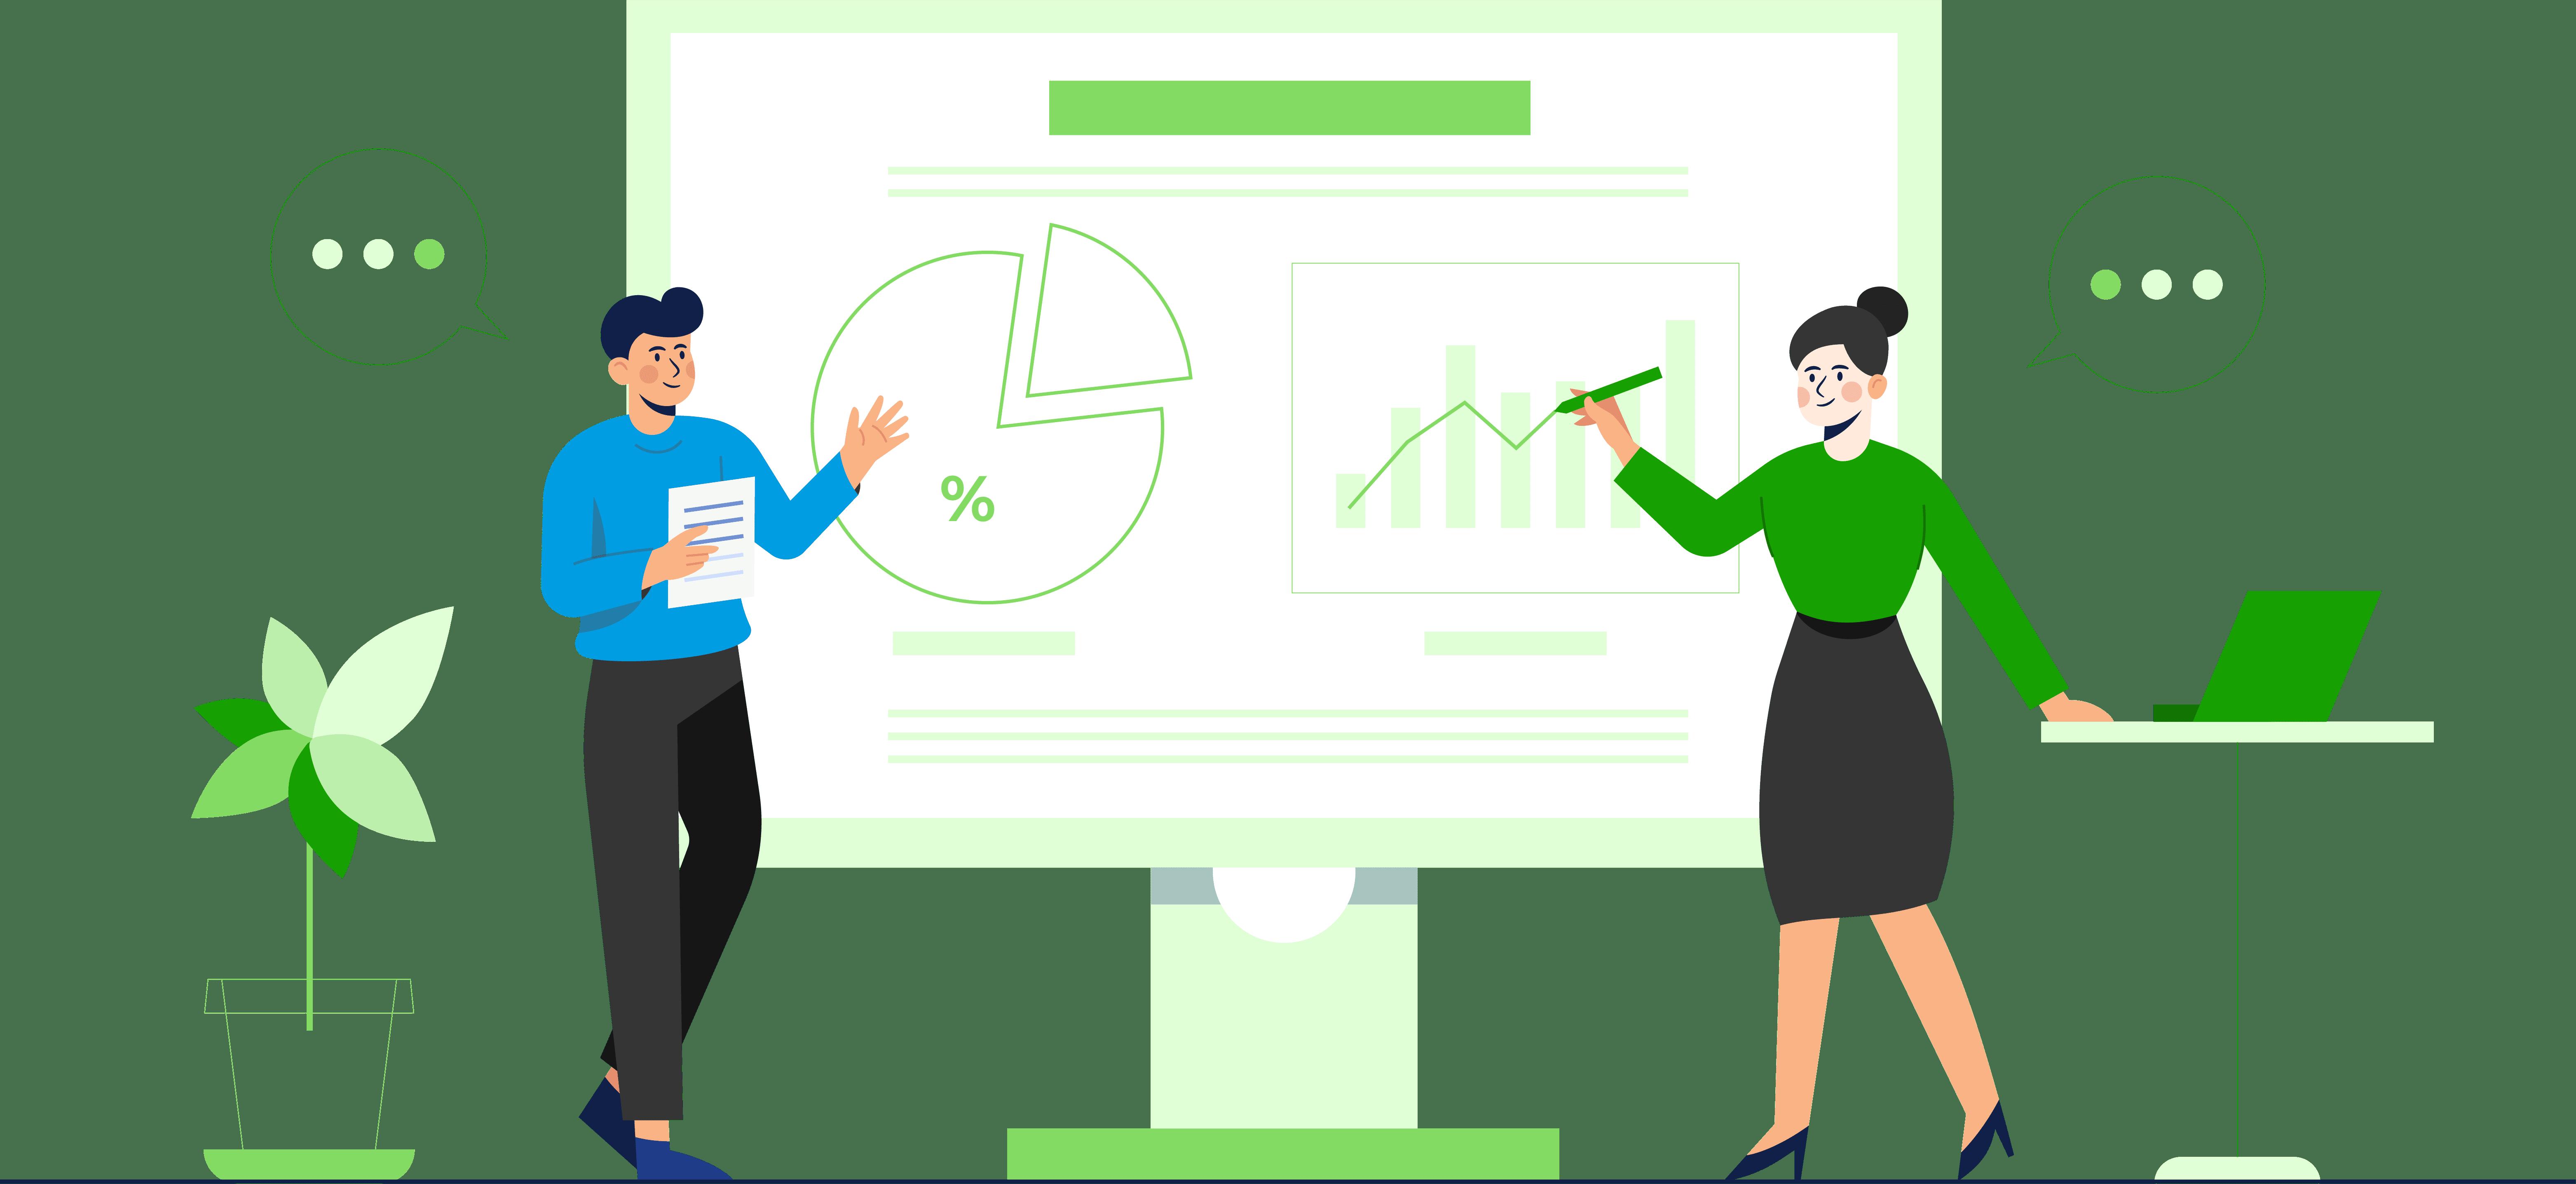 Presentation Illustration